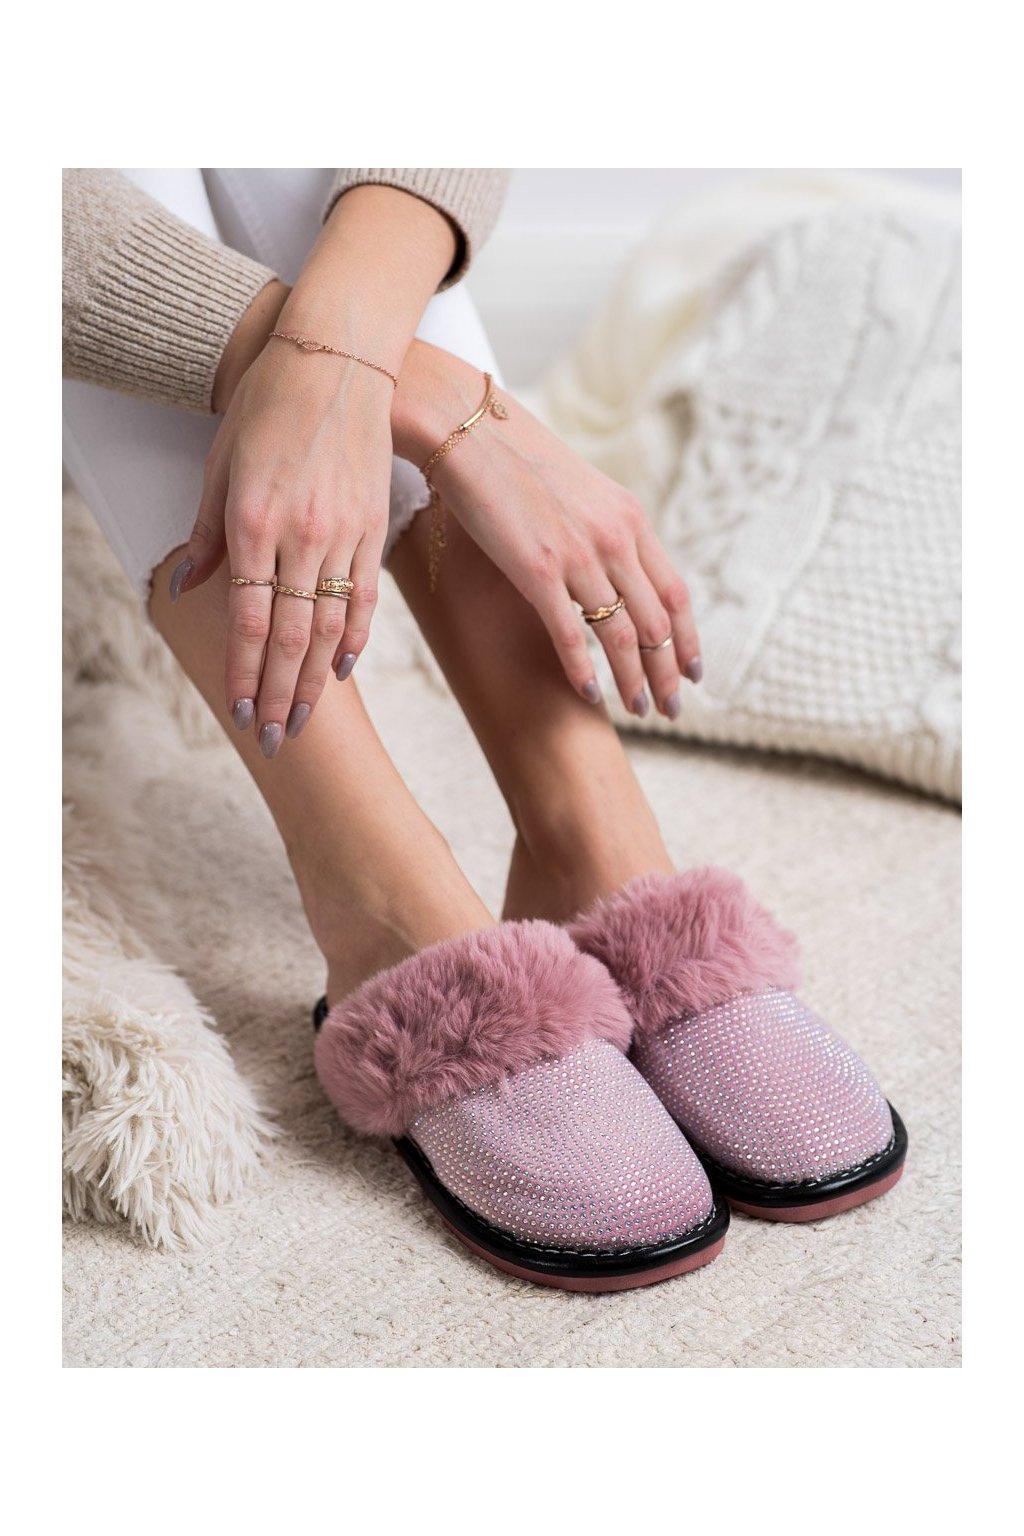 Fialové dámska obuv na doma Bona kod WG-215PU